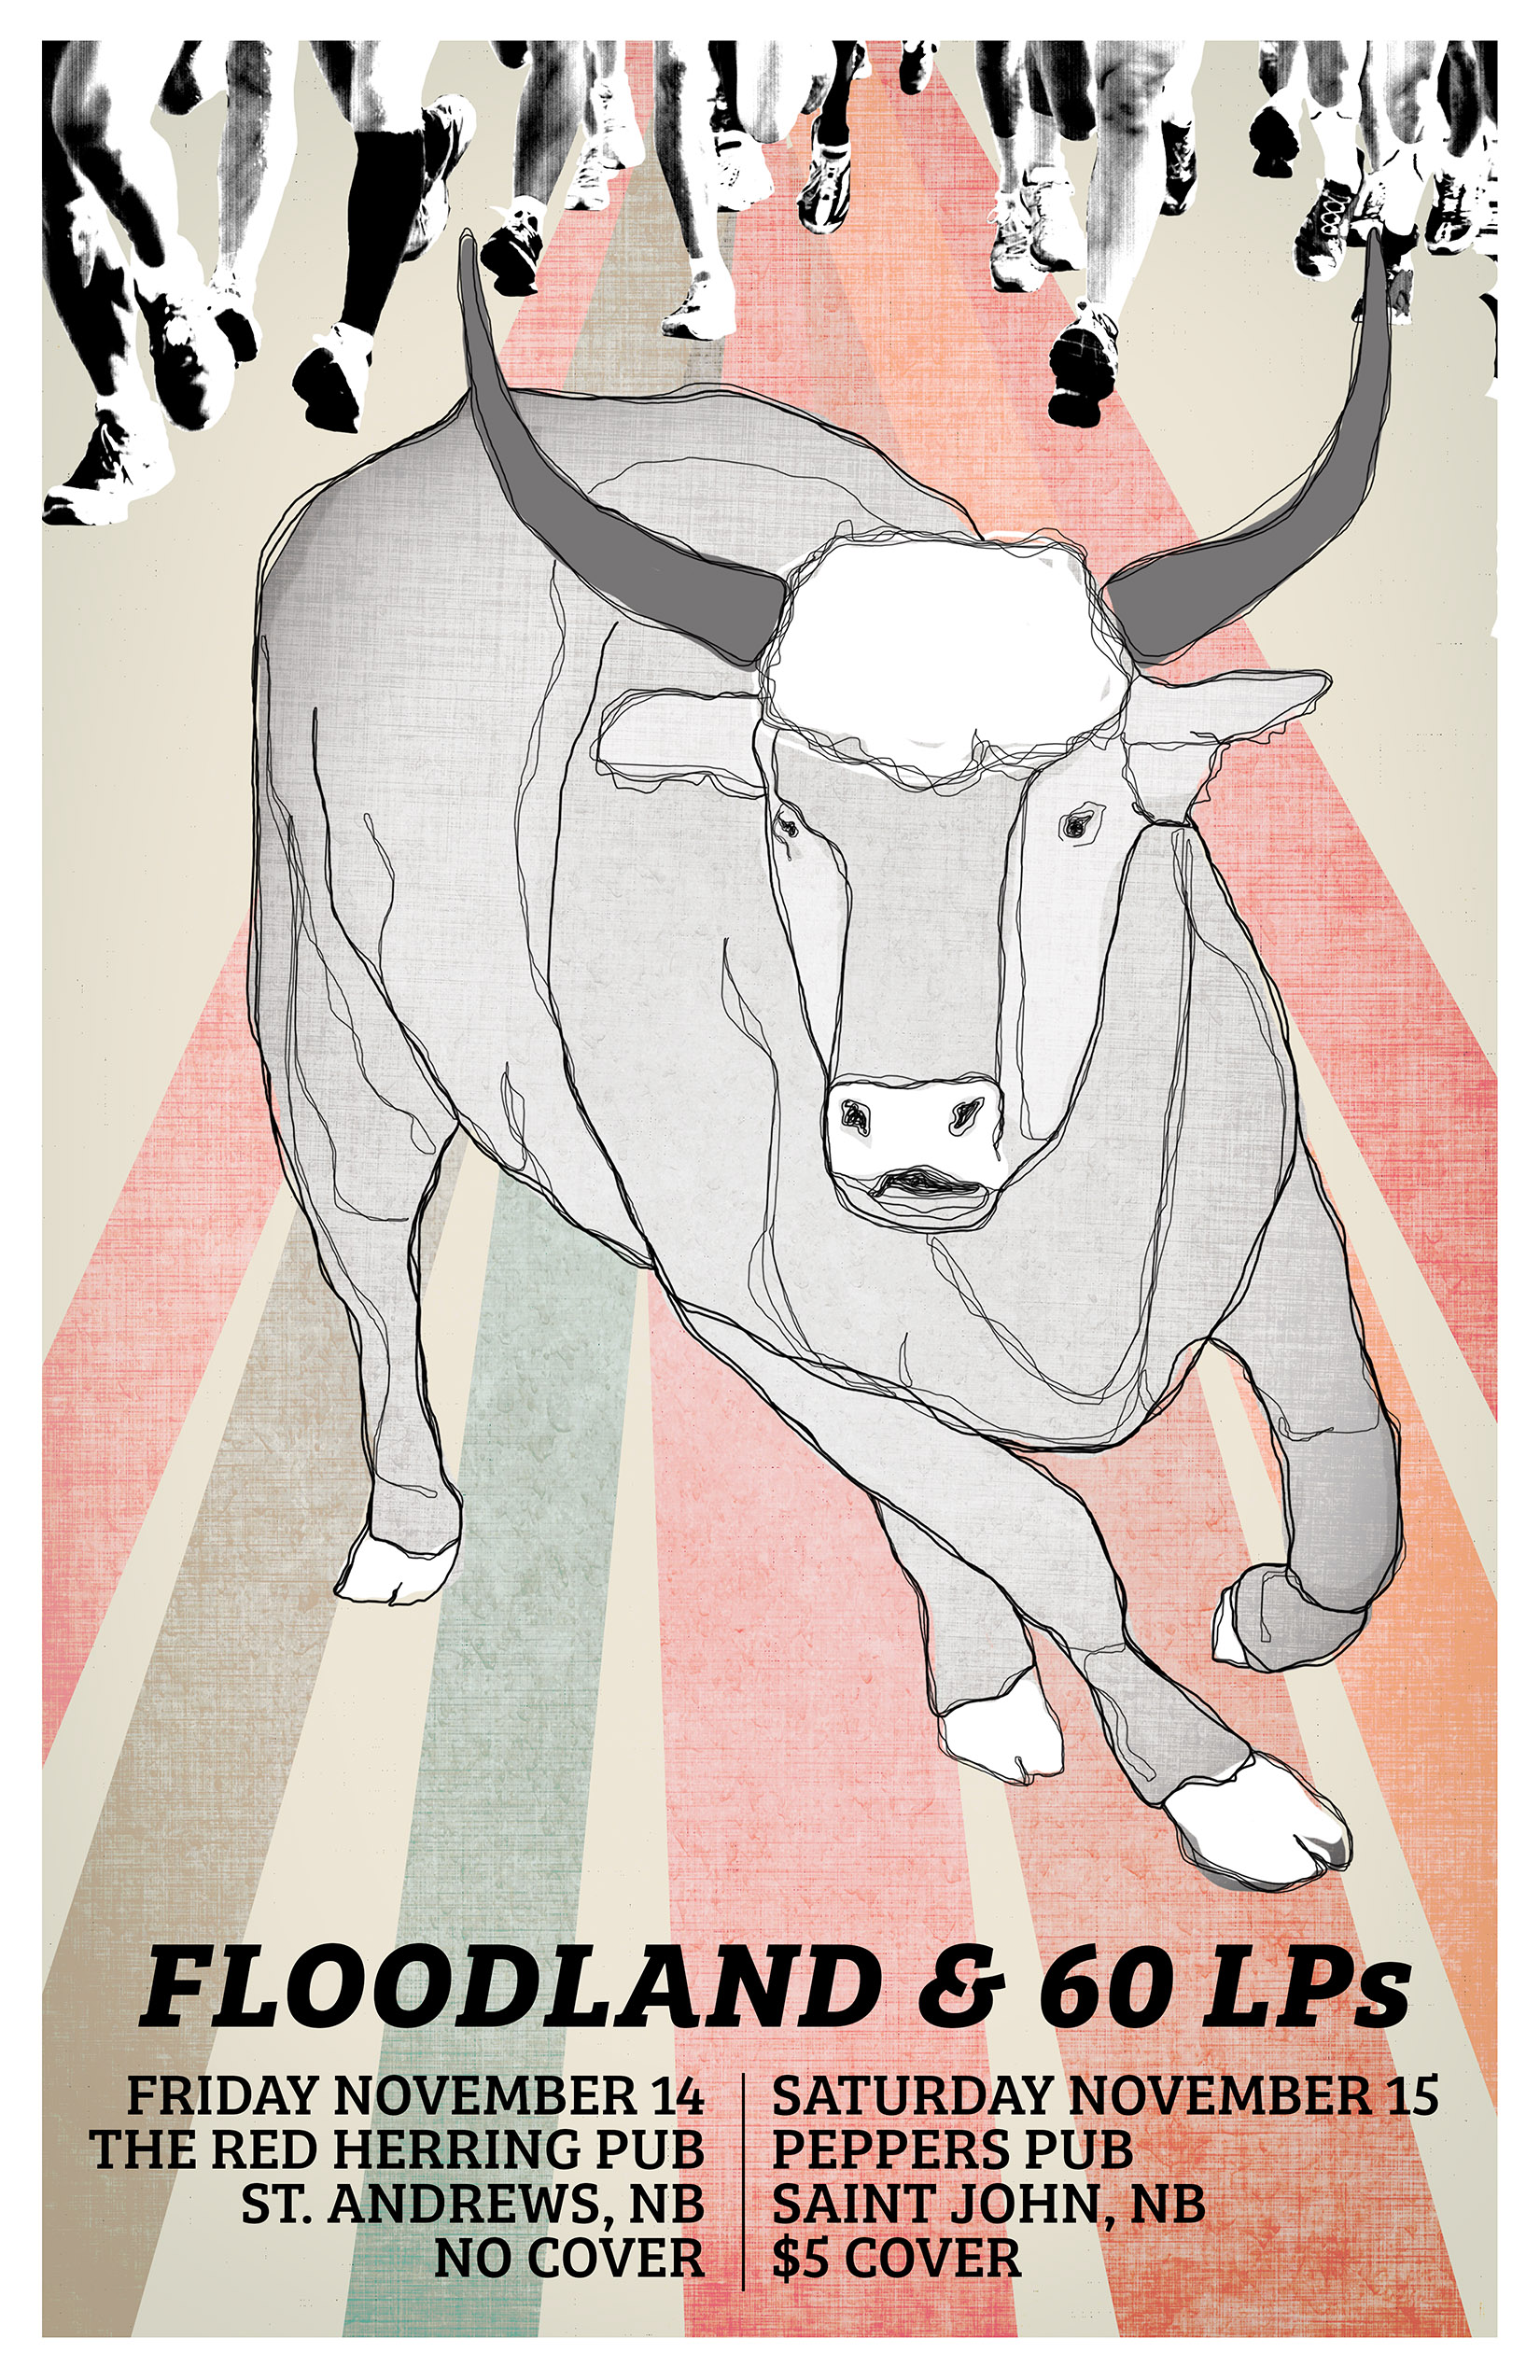 Floodland Poster NOV14_15 web.jpg